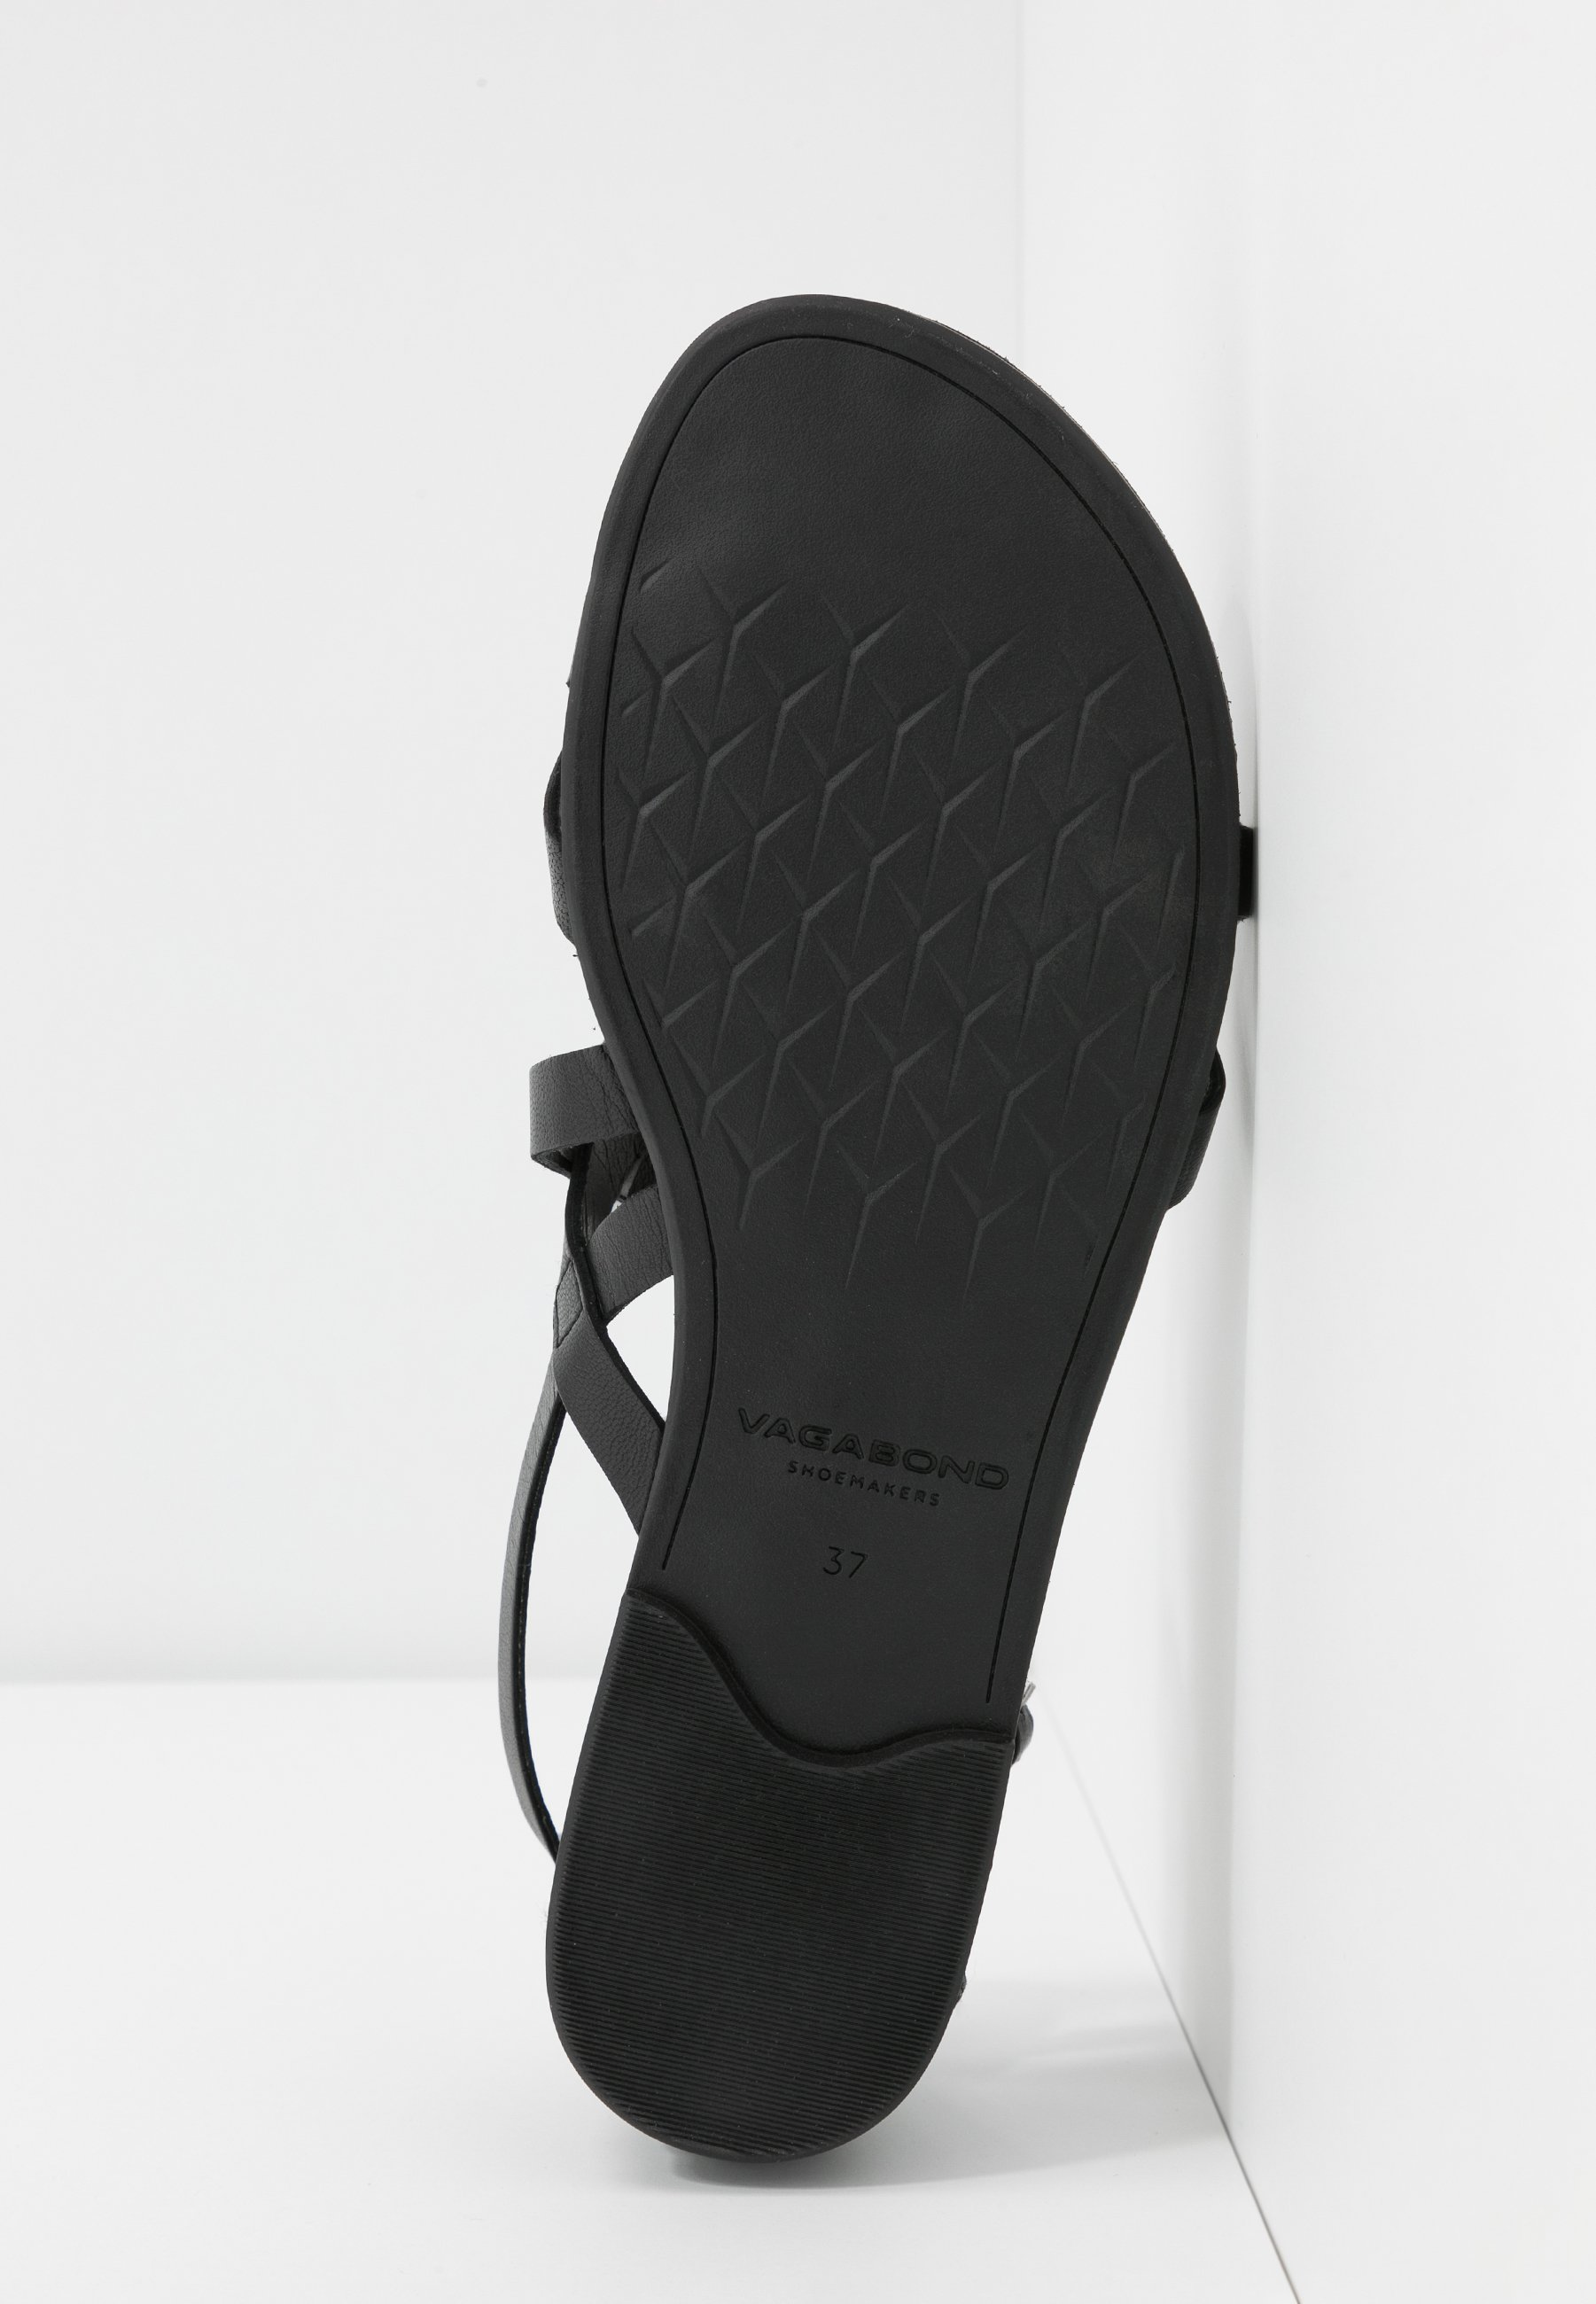 Vagabond Tia - Tongs Black